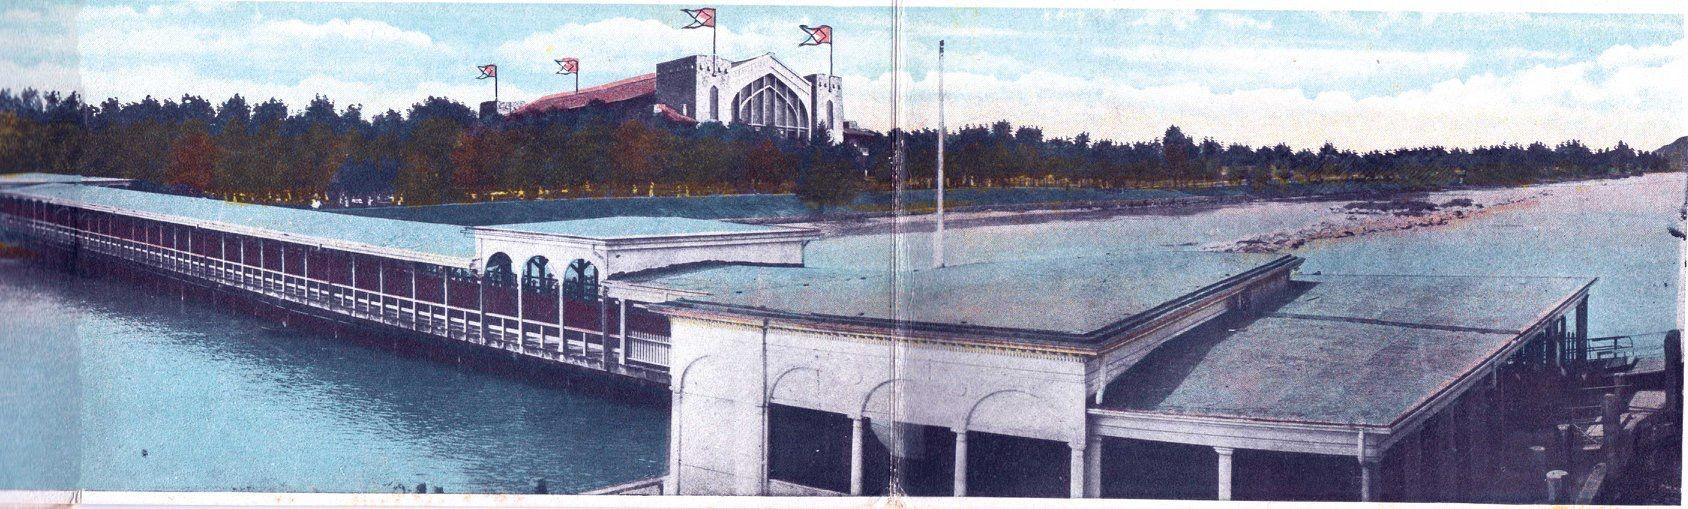 Circa 1910 BobLo Island at the original docks leading to